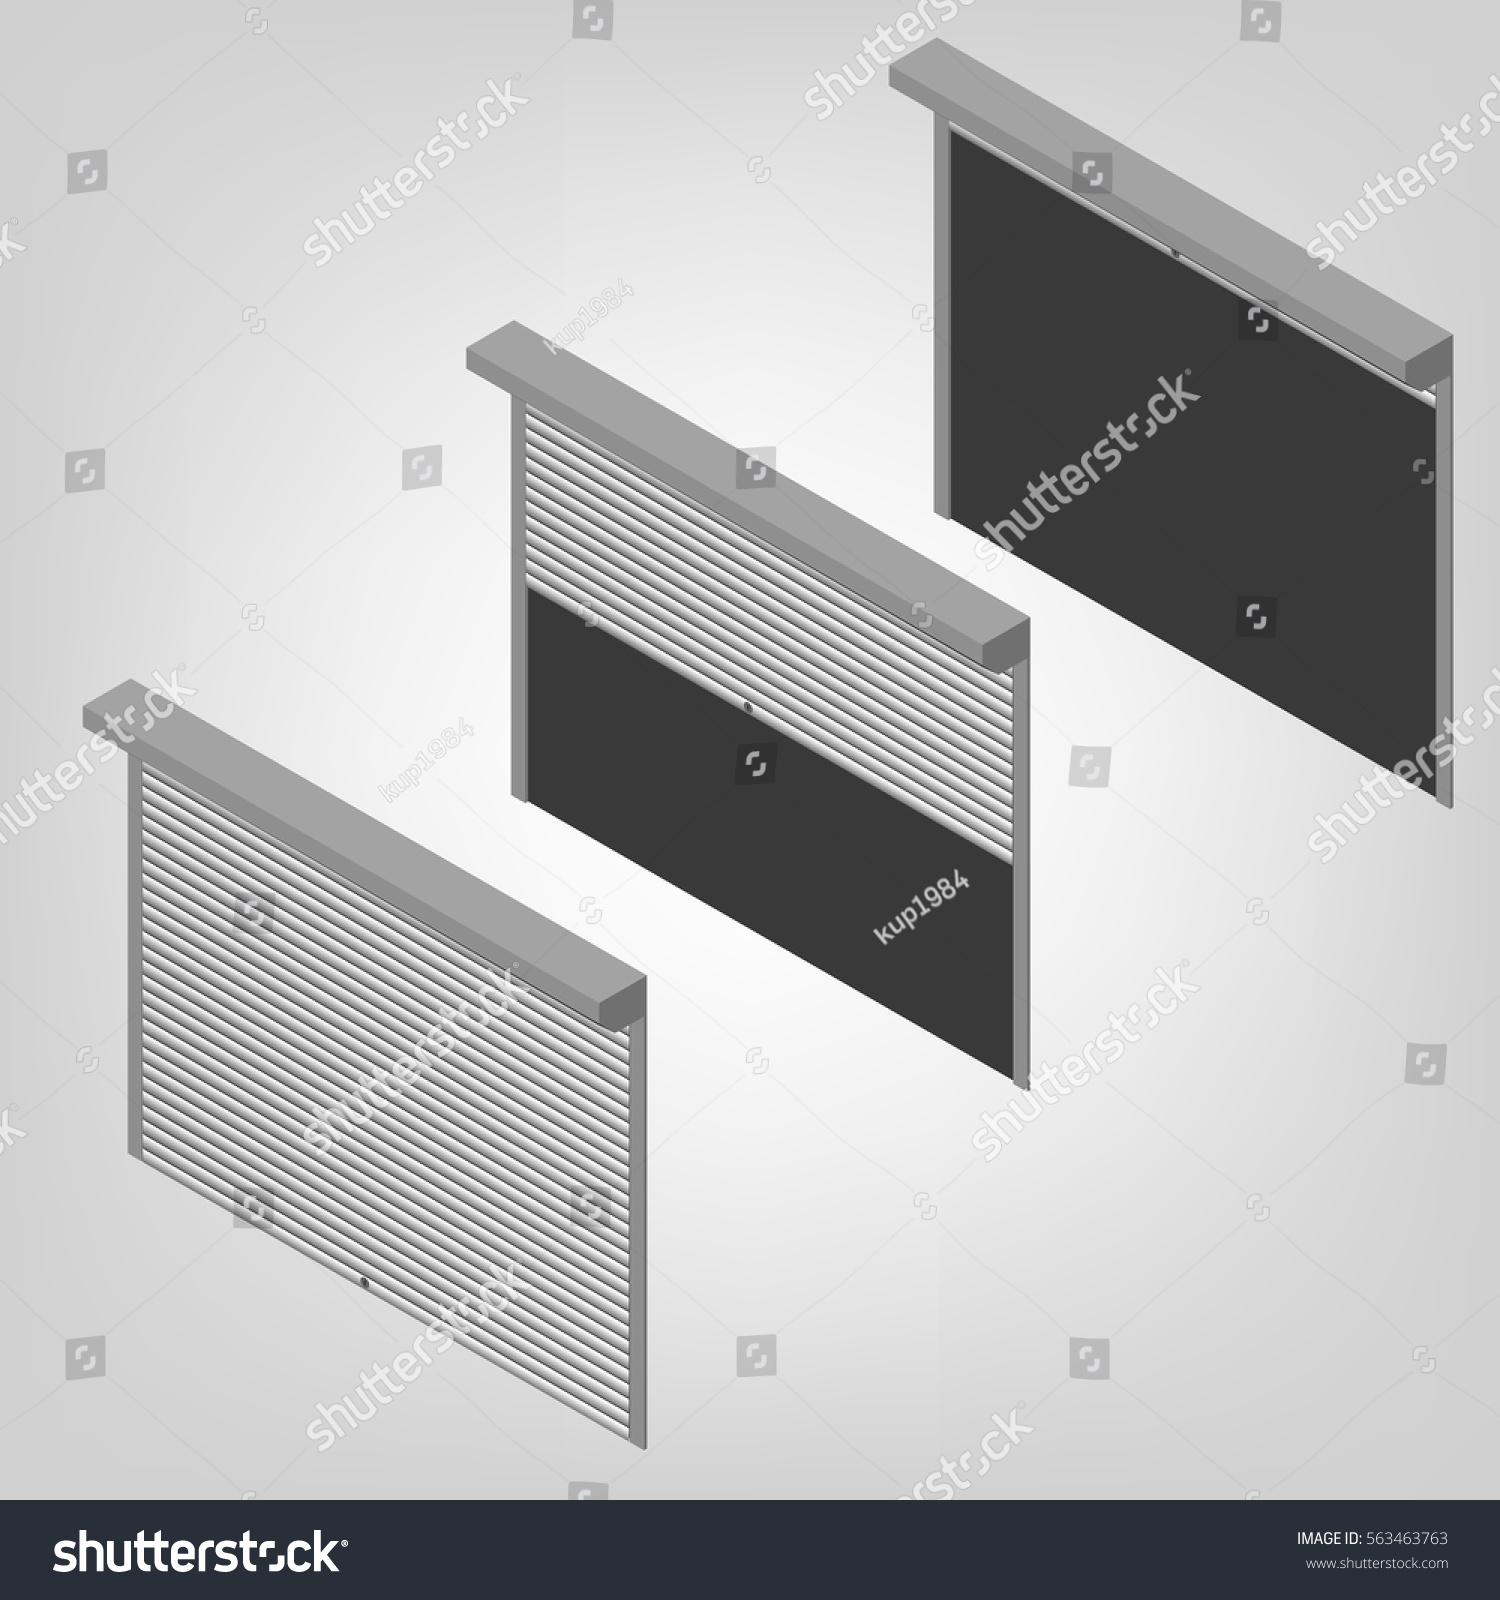 Steel Security Shutters Windows Doors Garage Royalty Free